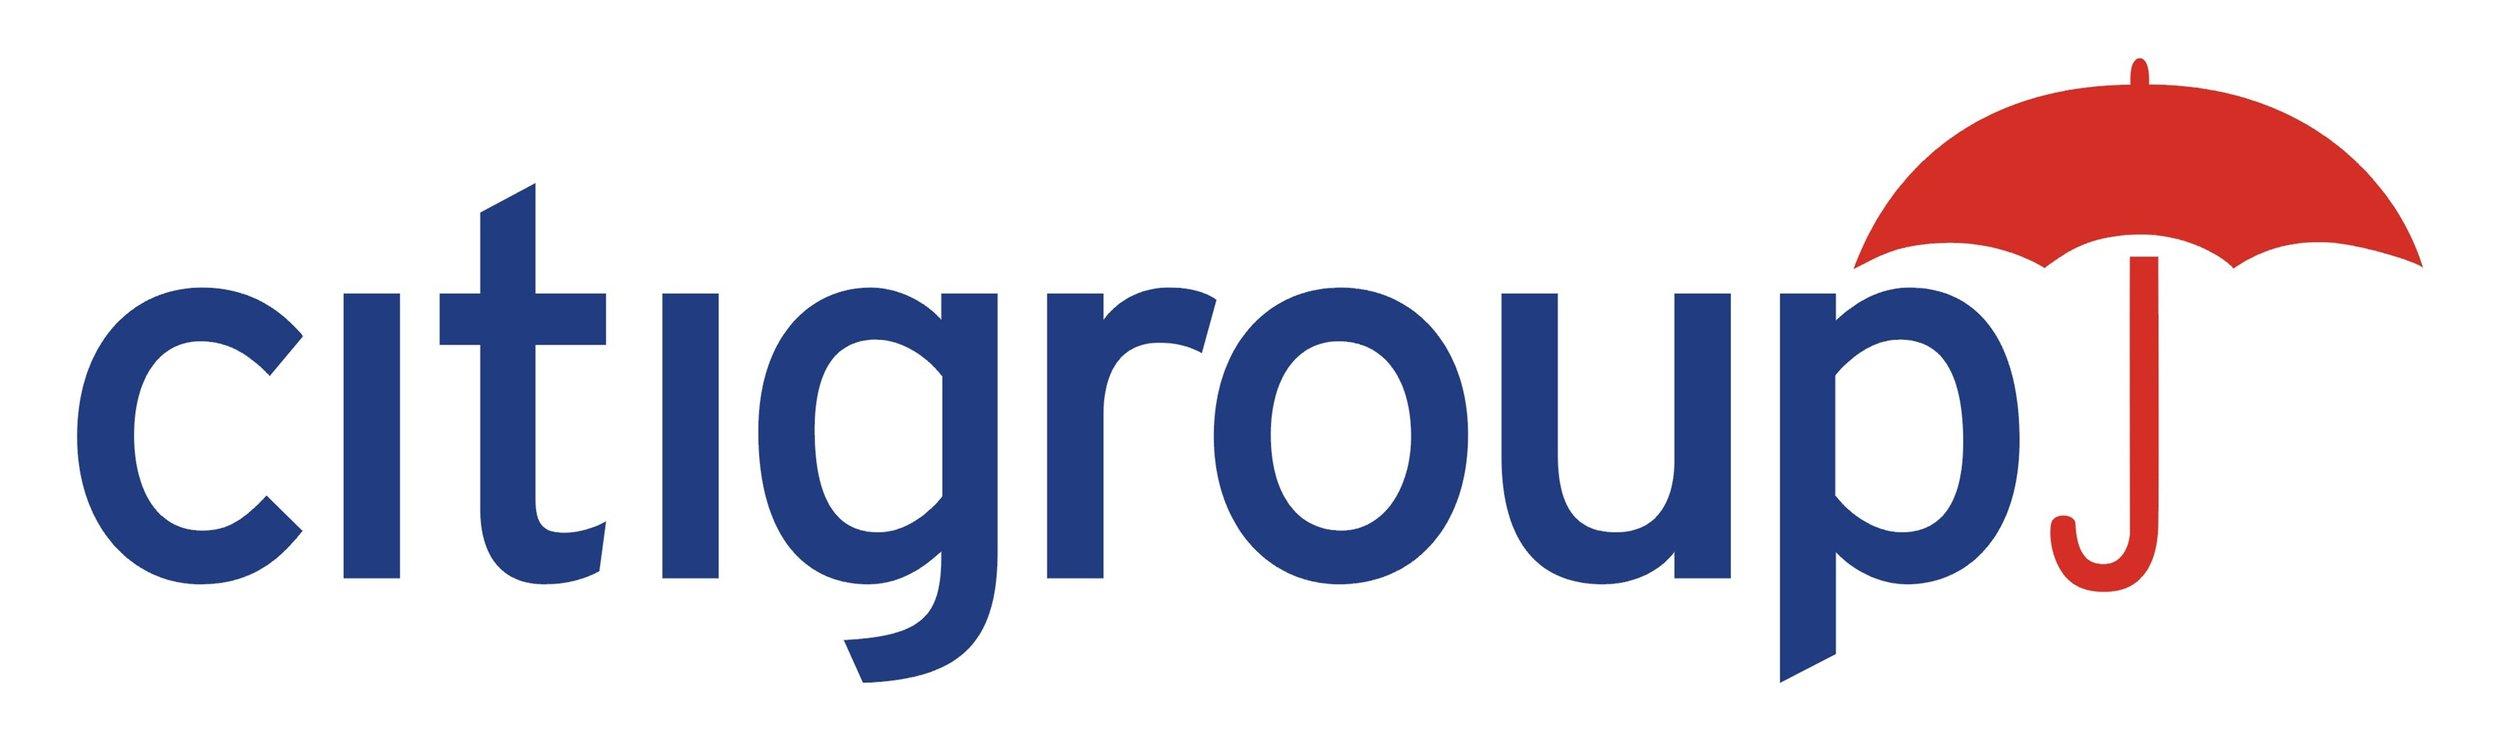 citigroup-logo.jpg